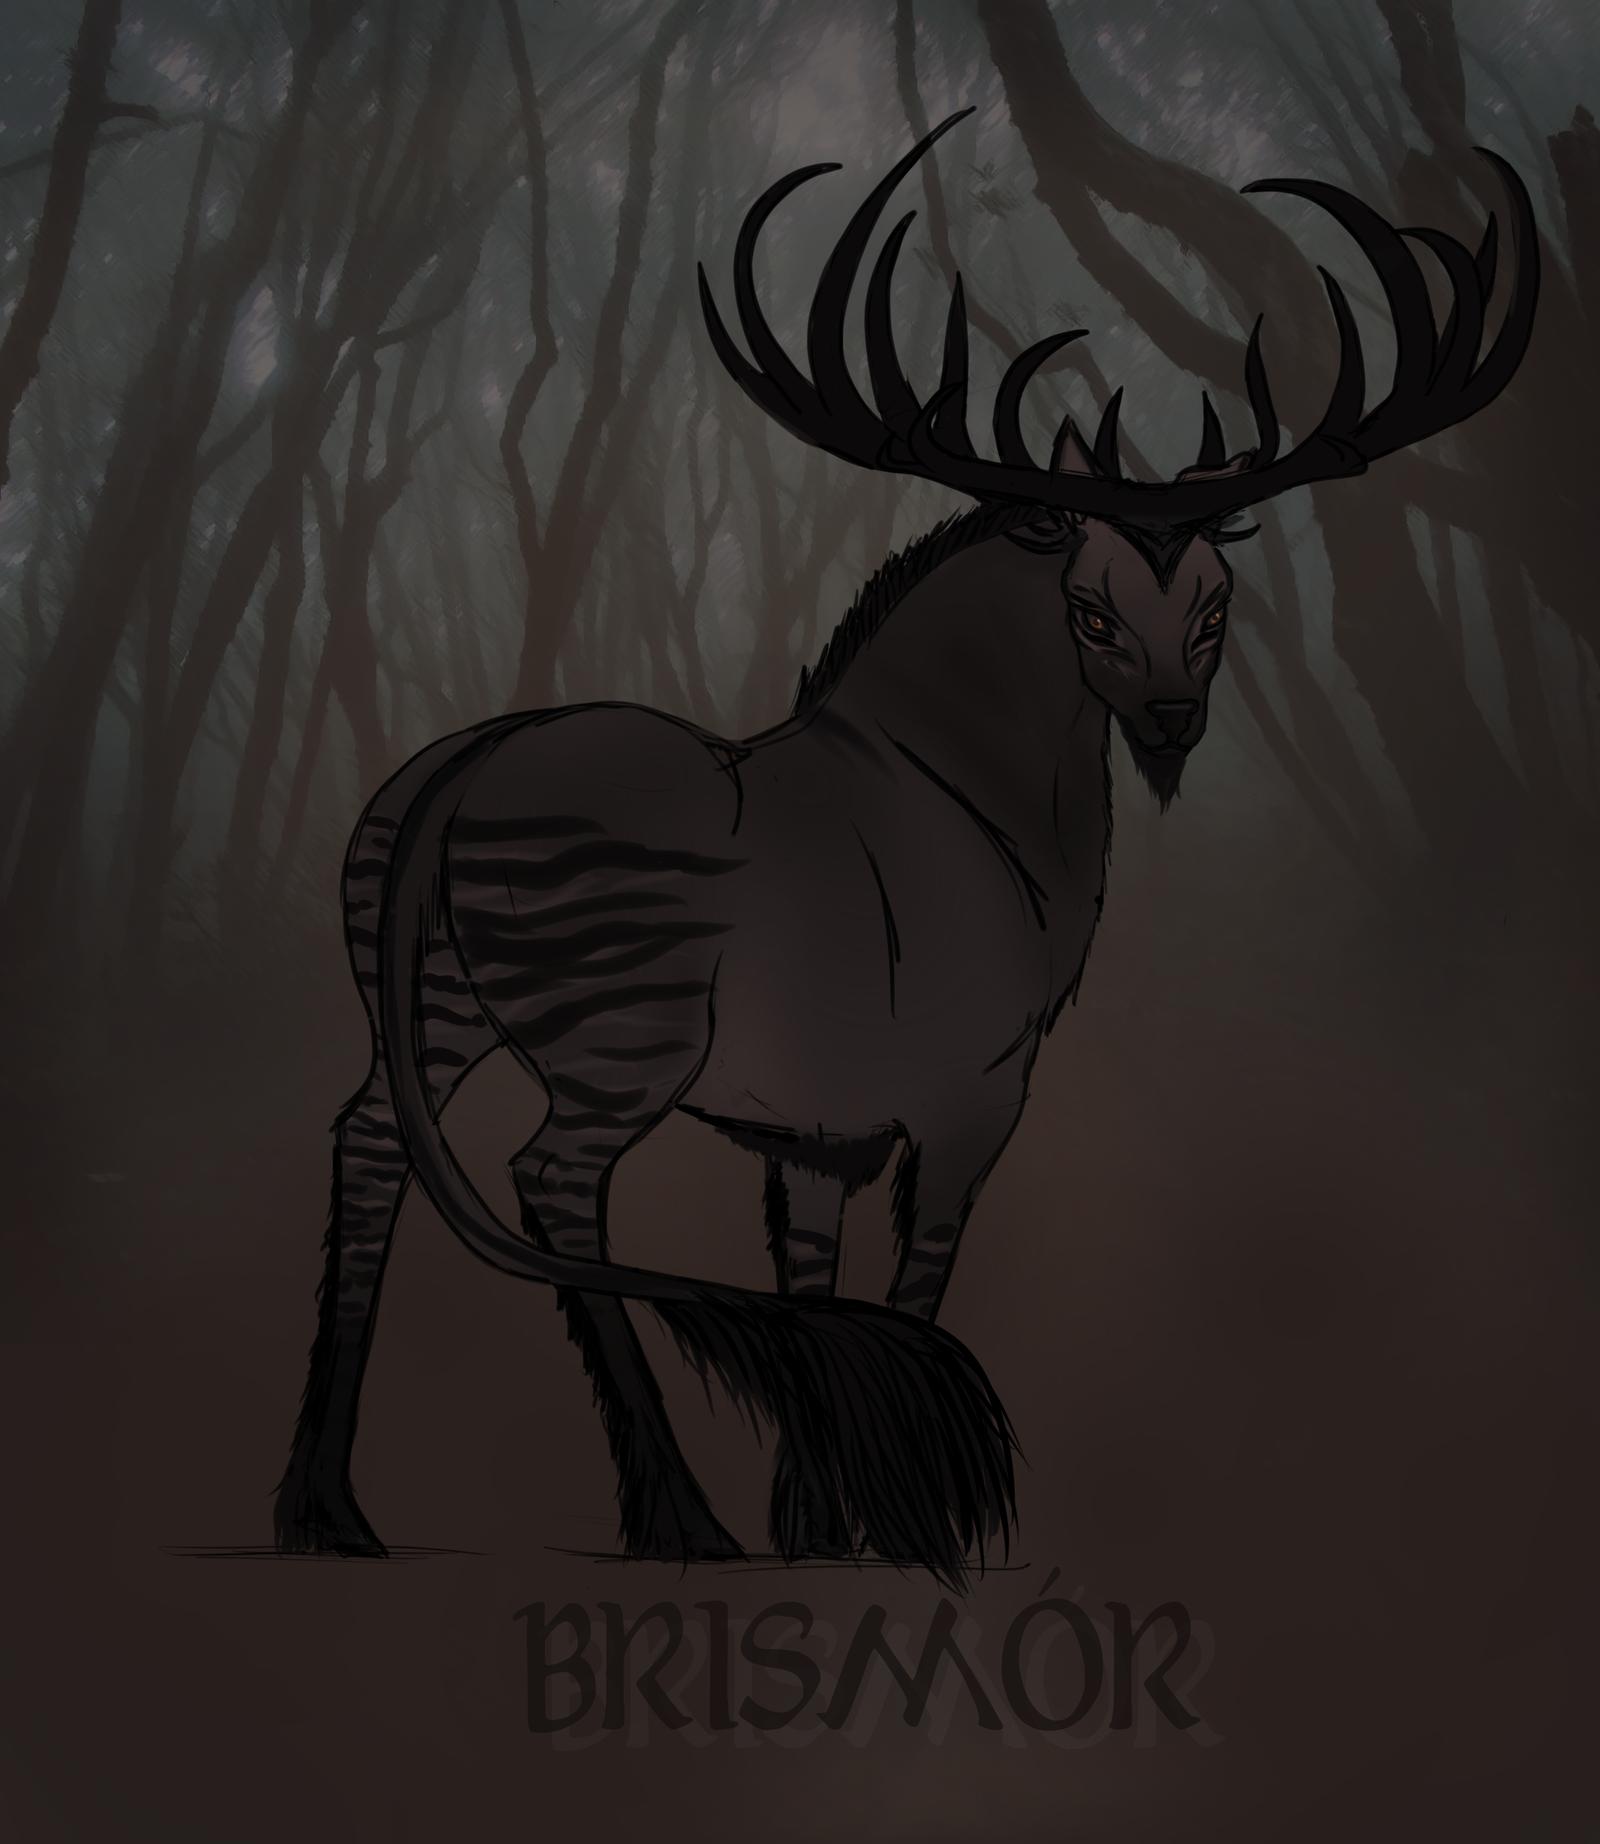 Brismor by LadyBrael